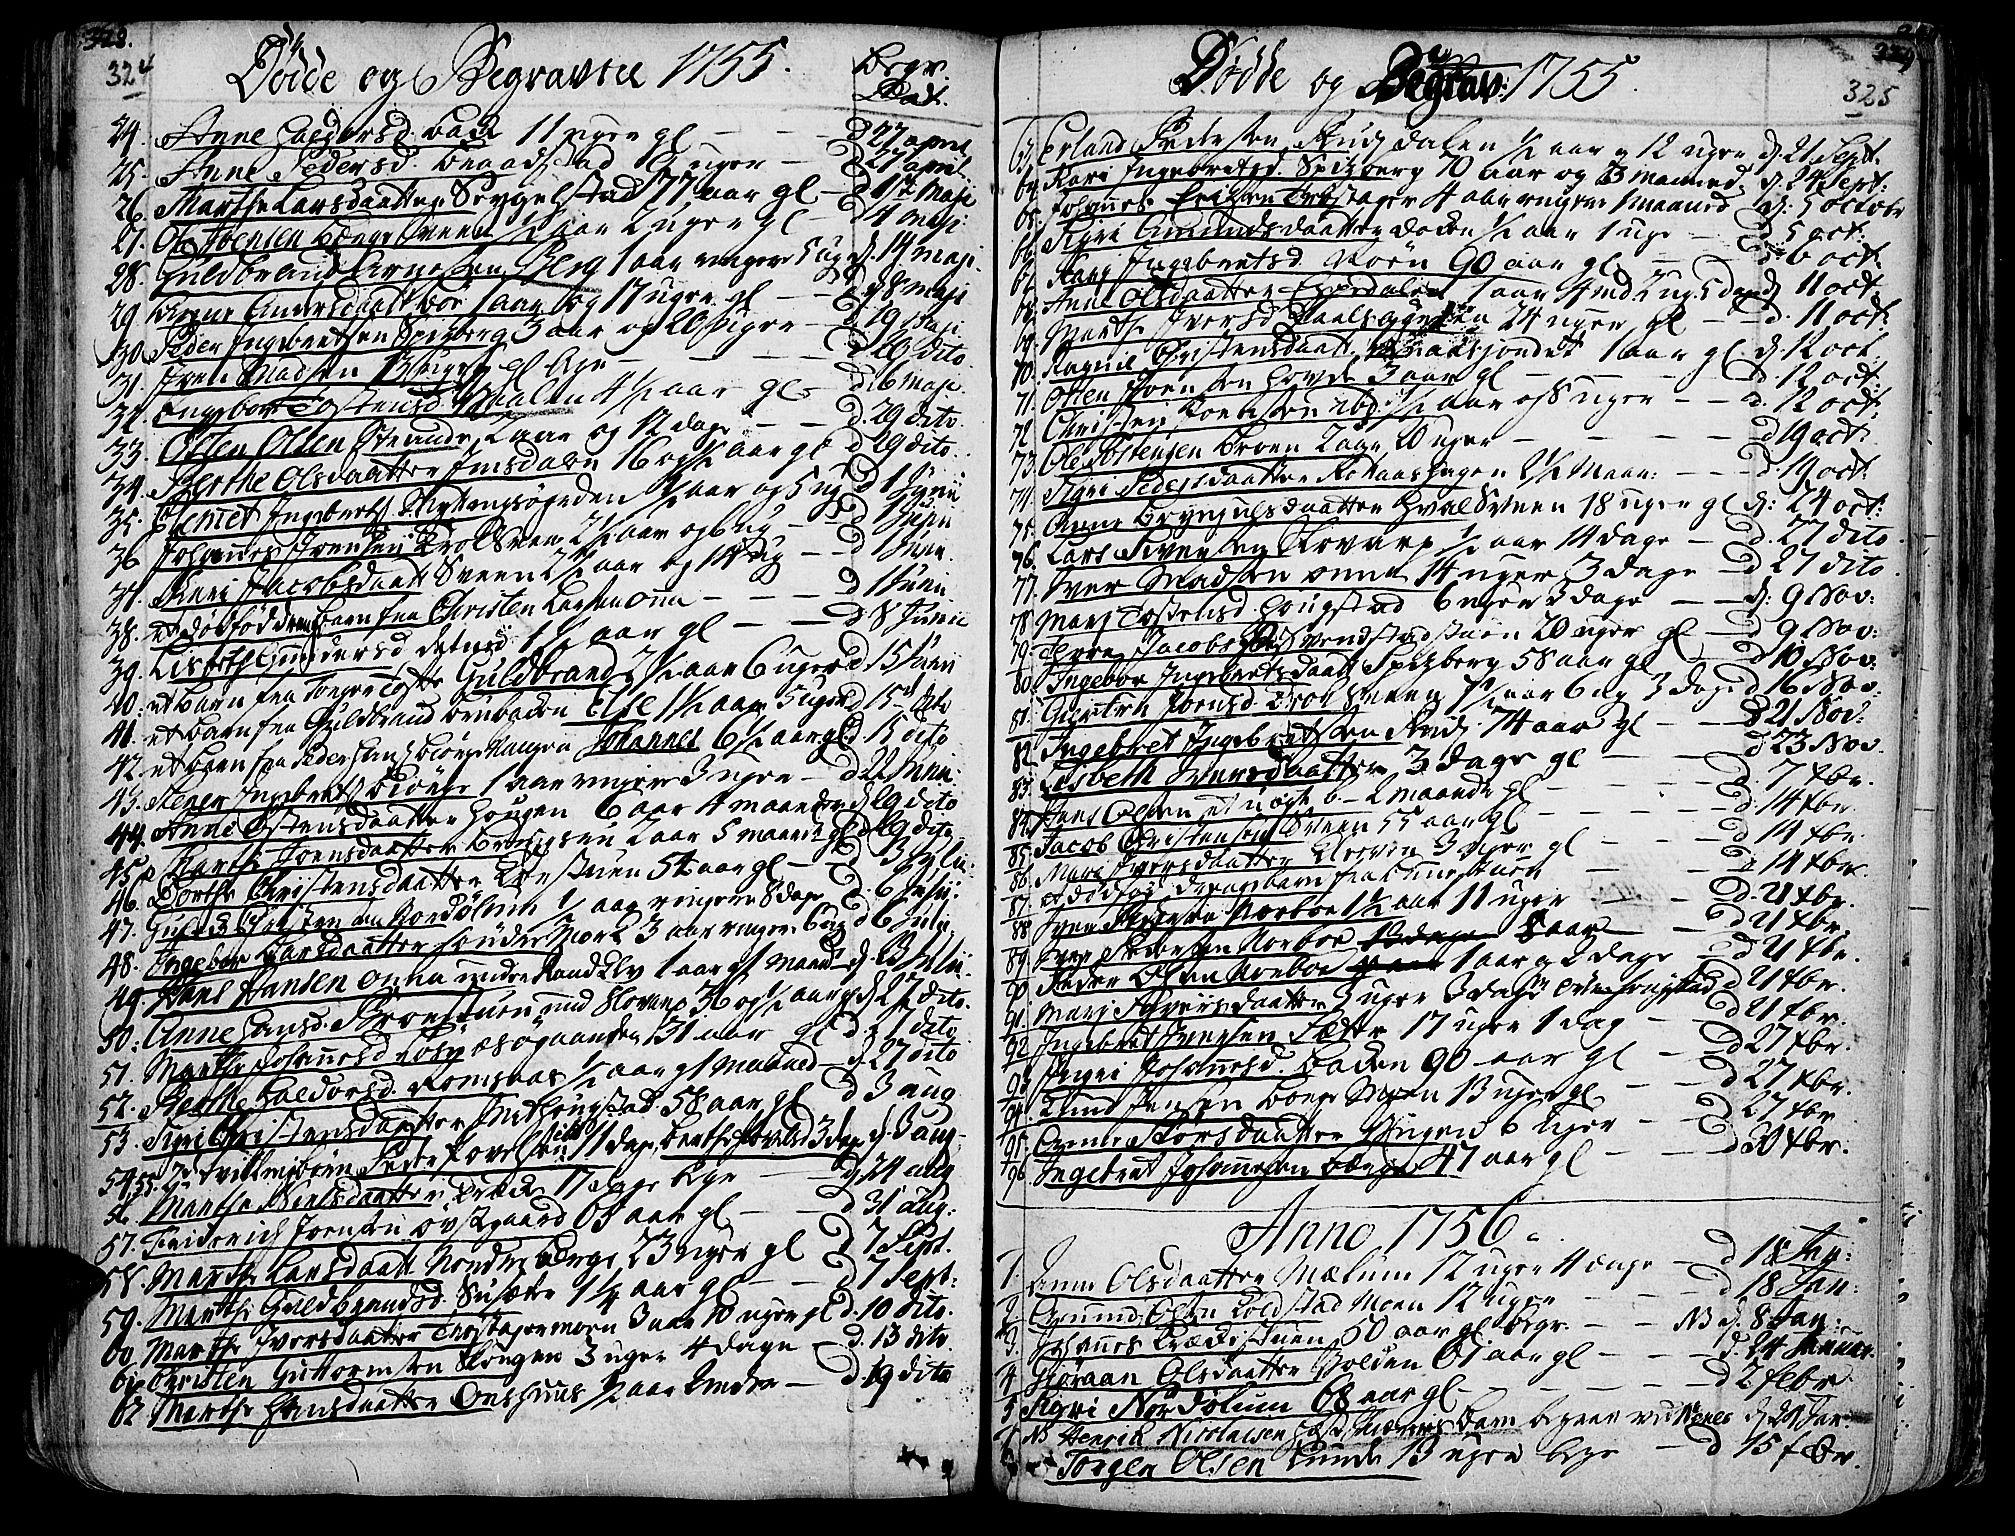 SAH, Ringebu prestekontor, Ministerialbok nr. 2, 1734-1780, s. 324-325